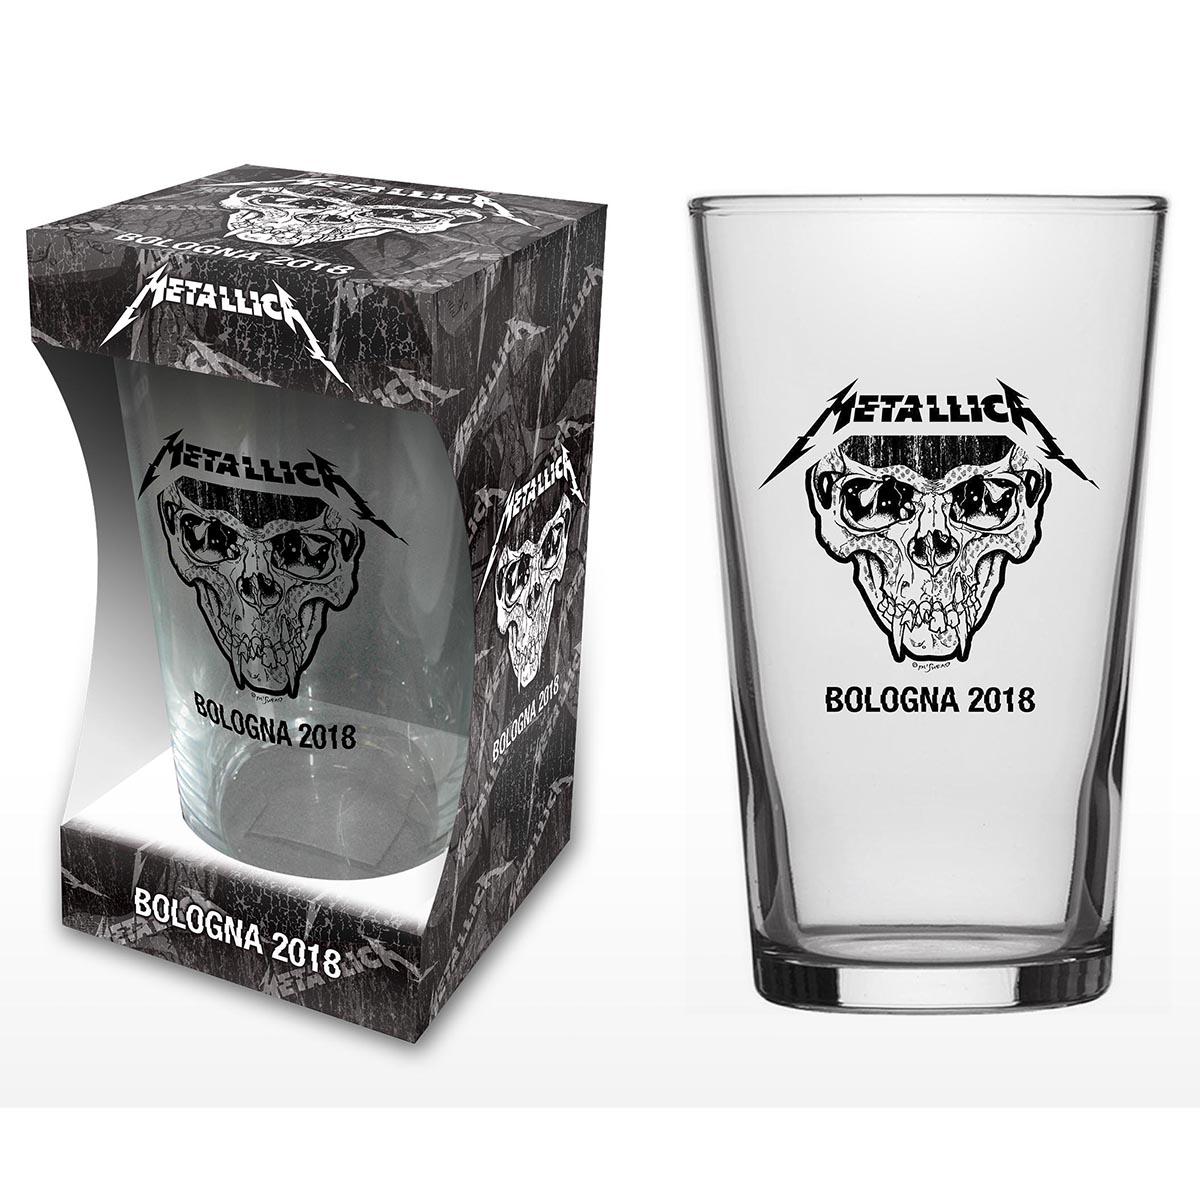 Bologna – Pint Glass - Metallica